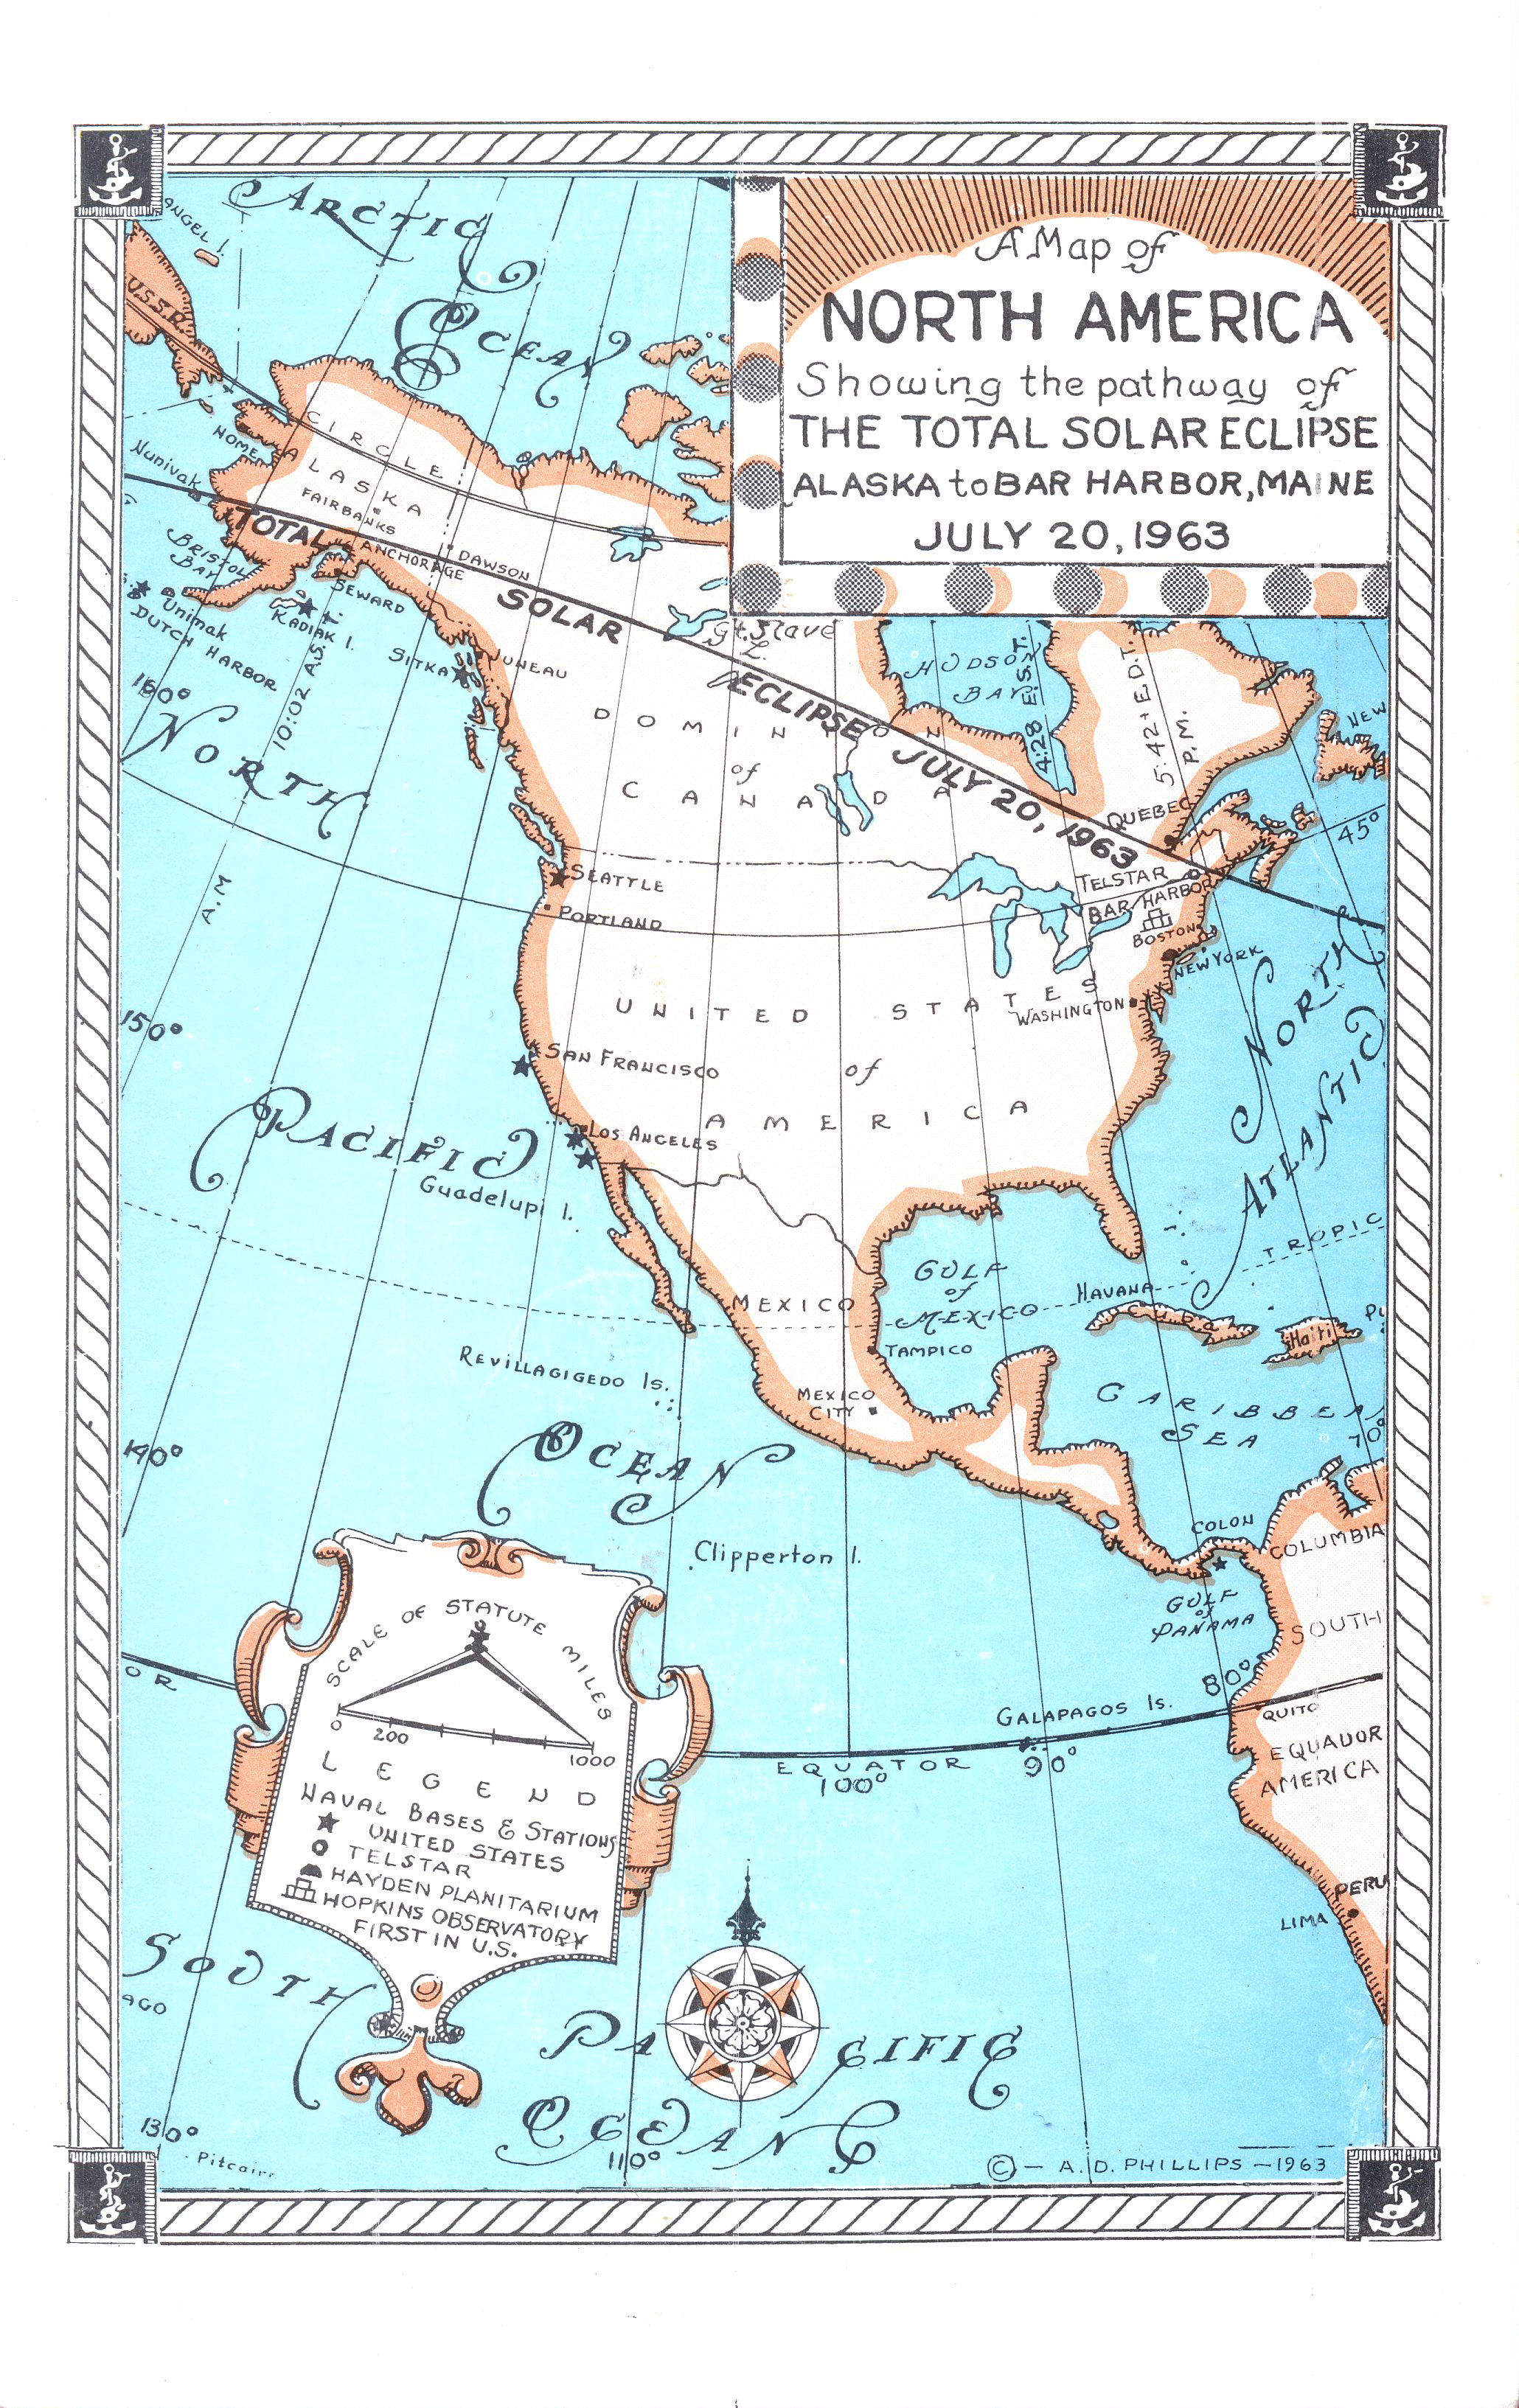 1963_July_20_TSE_Map_of_North_America_A_D_Phillips.jpg